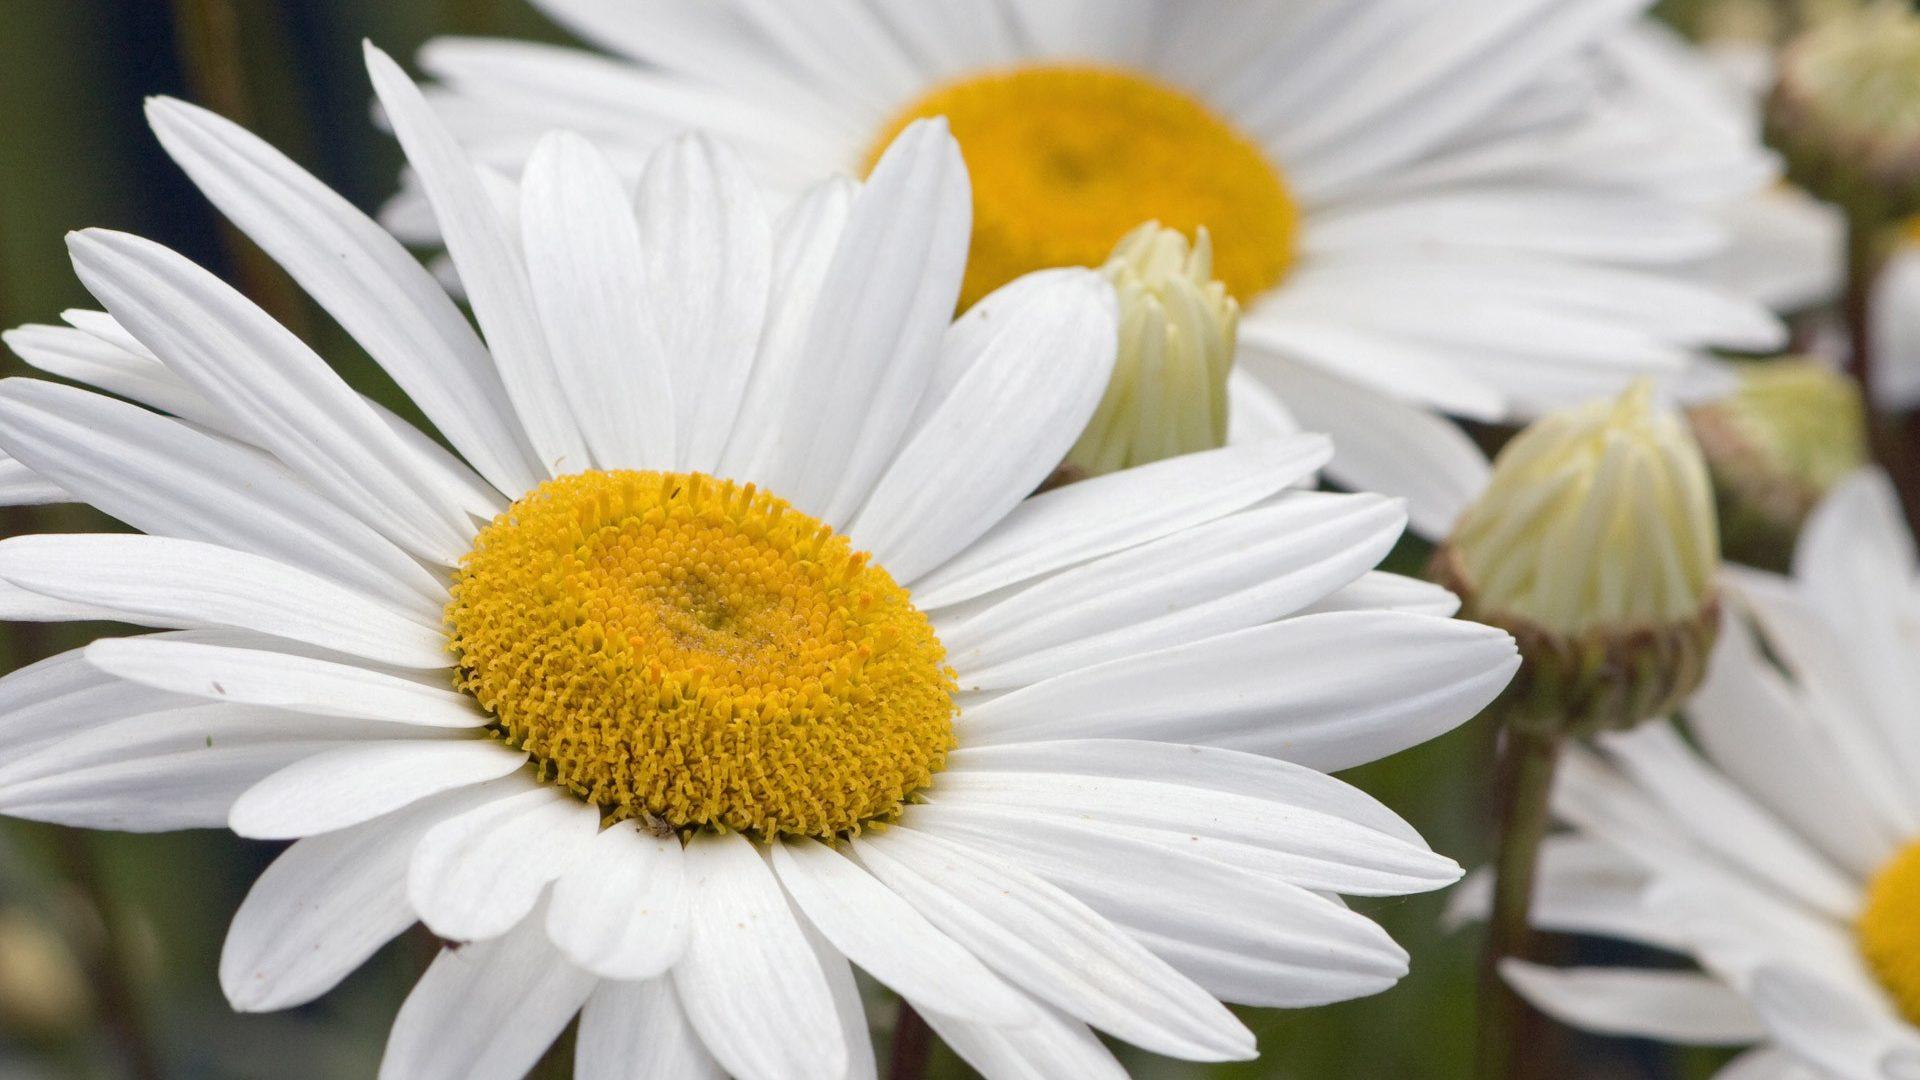 Free Photo White Flower White Plant Bloom Cc0 License Free